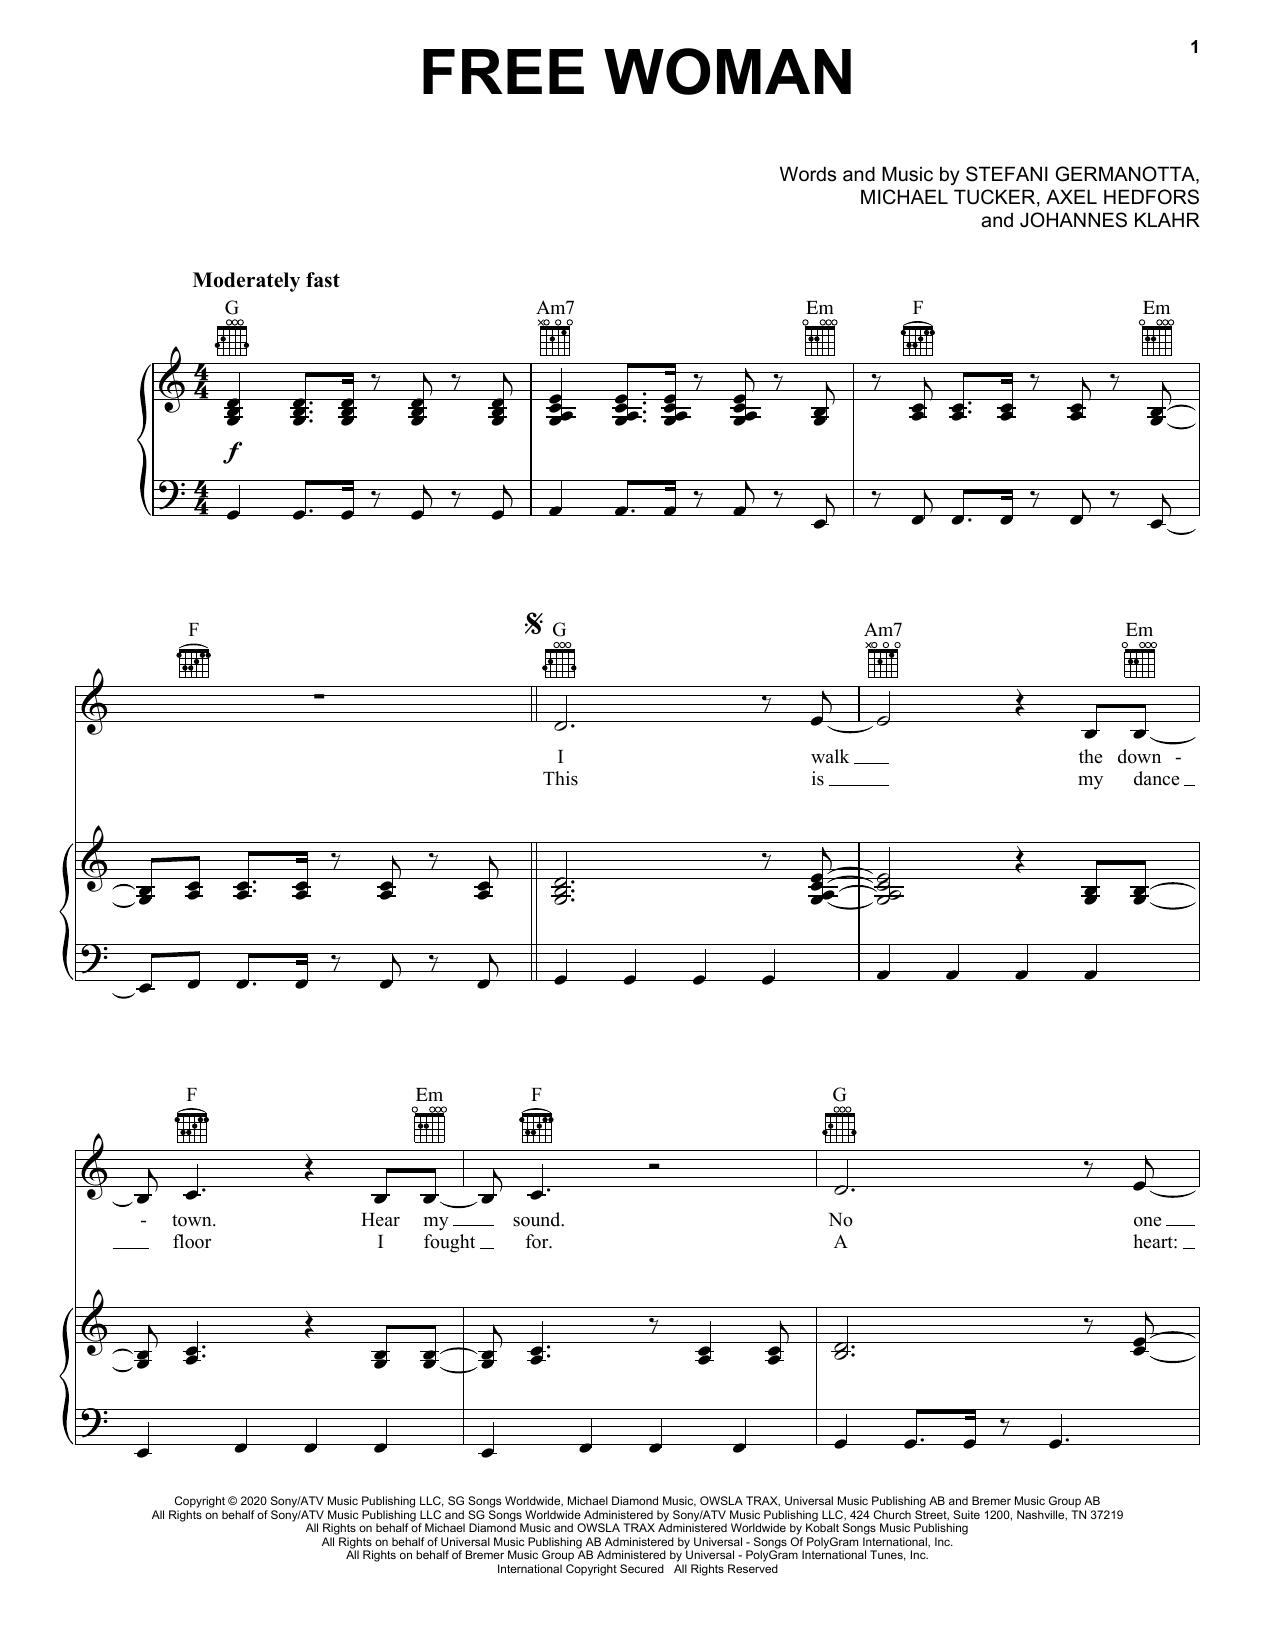 Lady Gaga Free Woman sheet music notes and chords. Download Printable PDF.